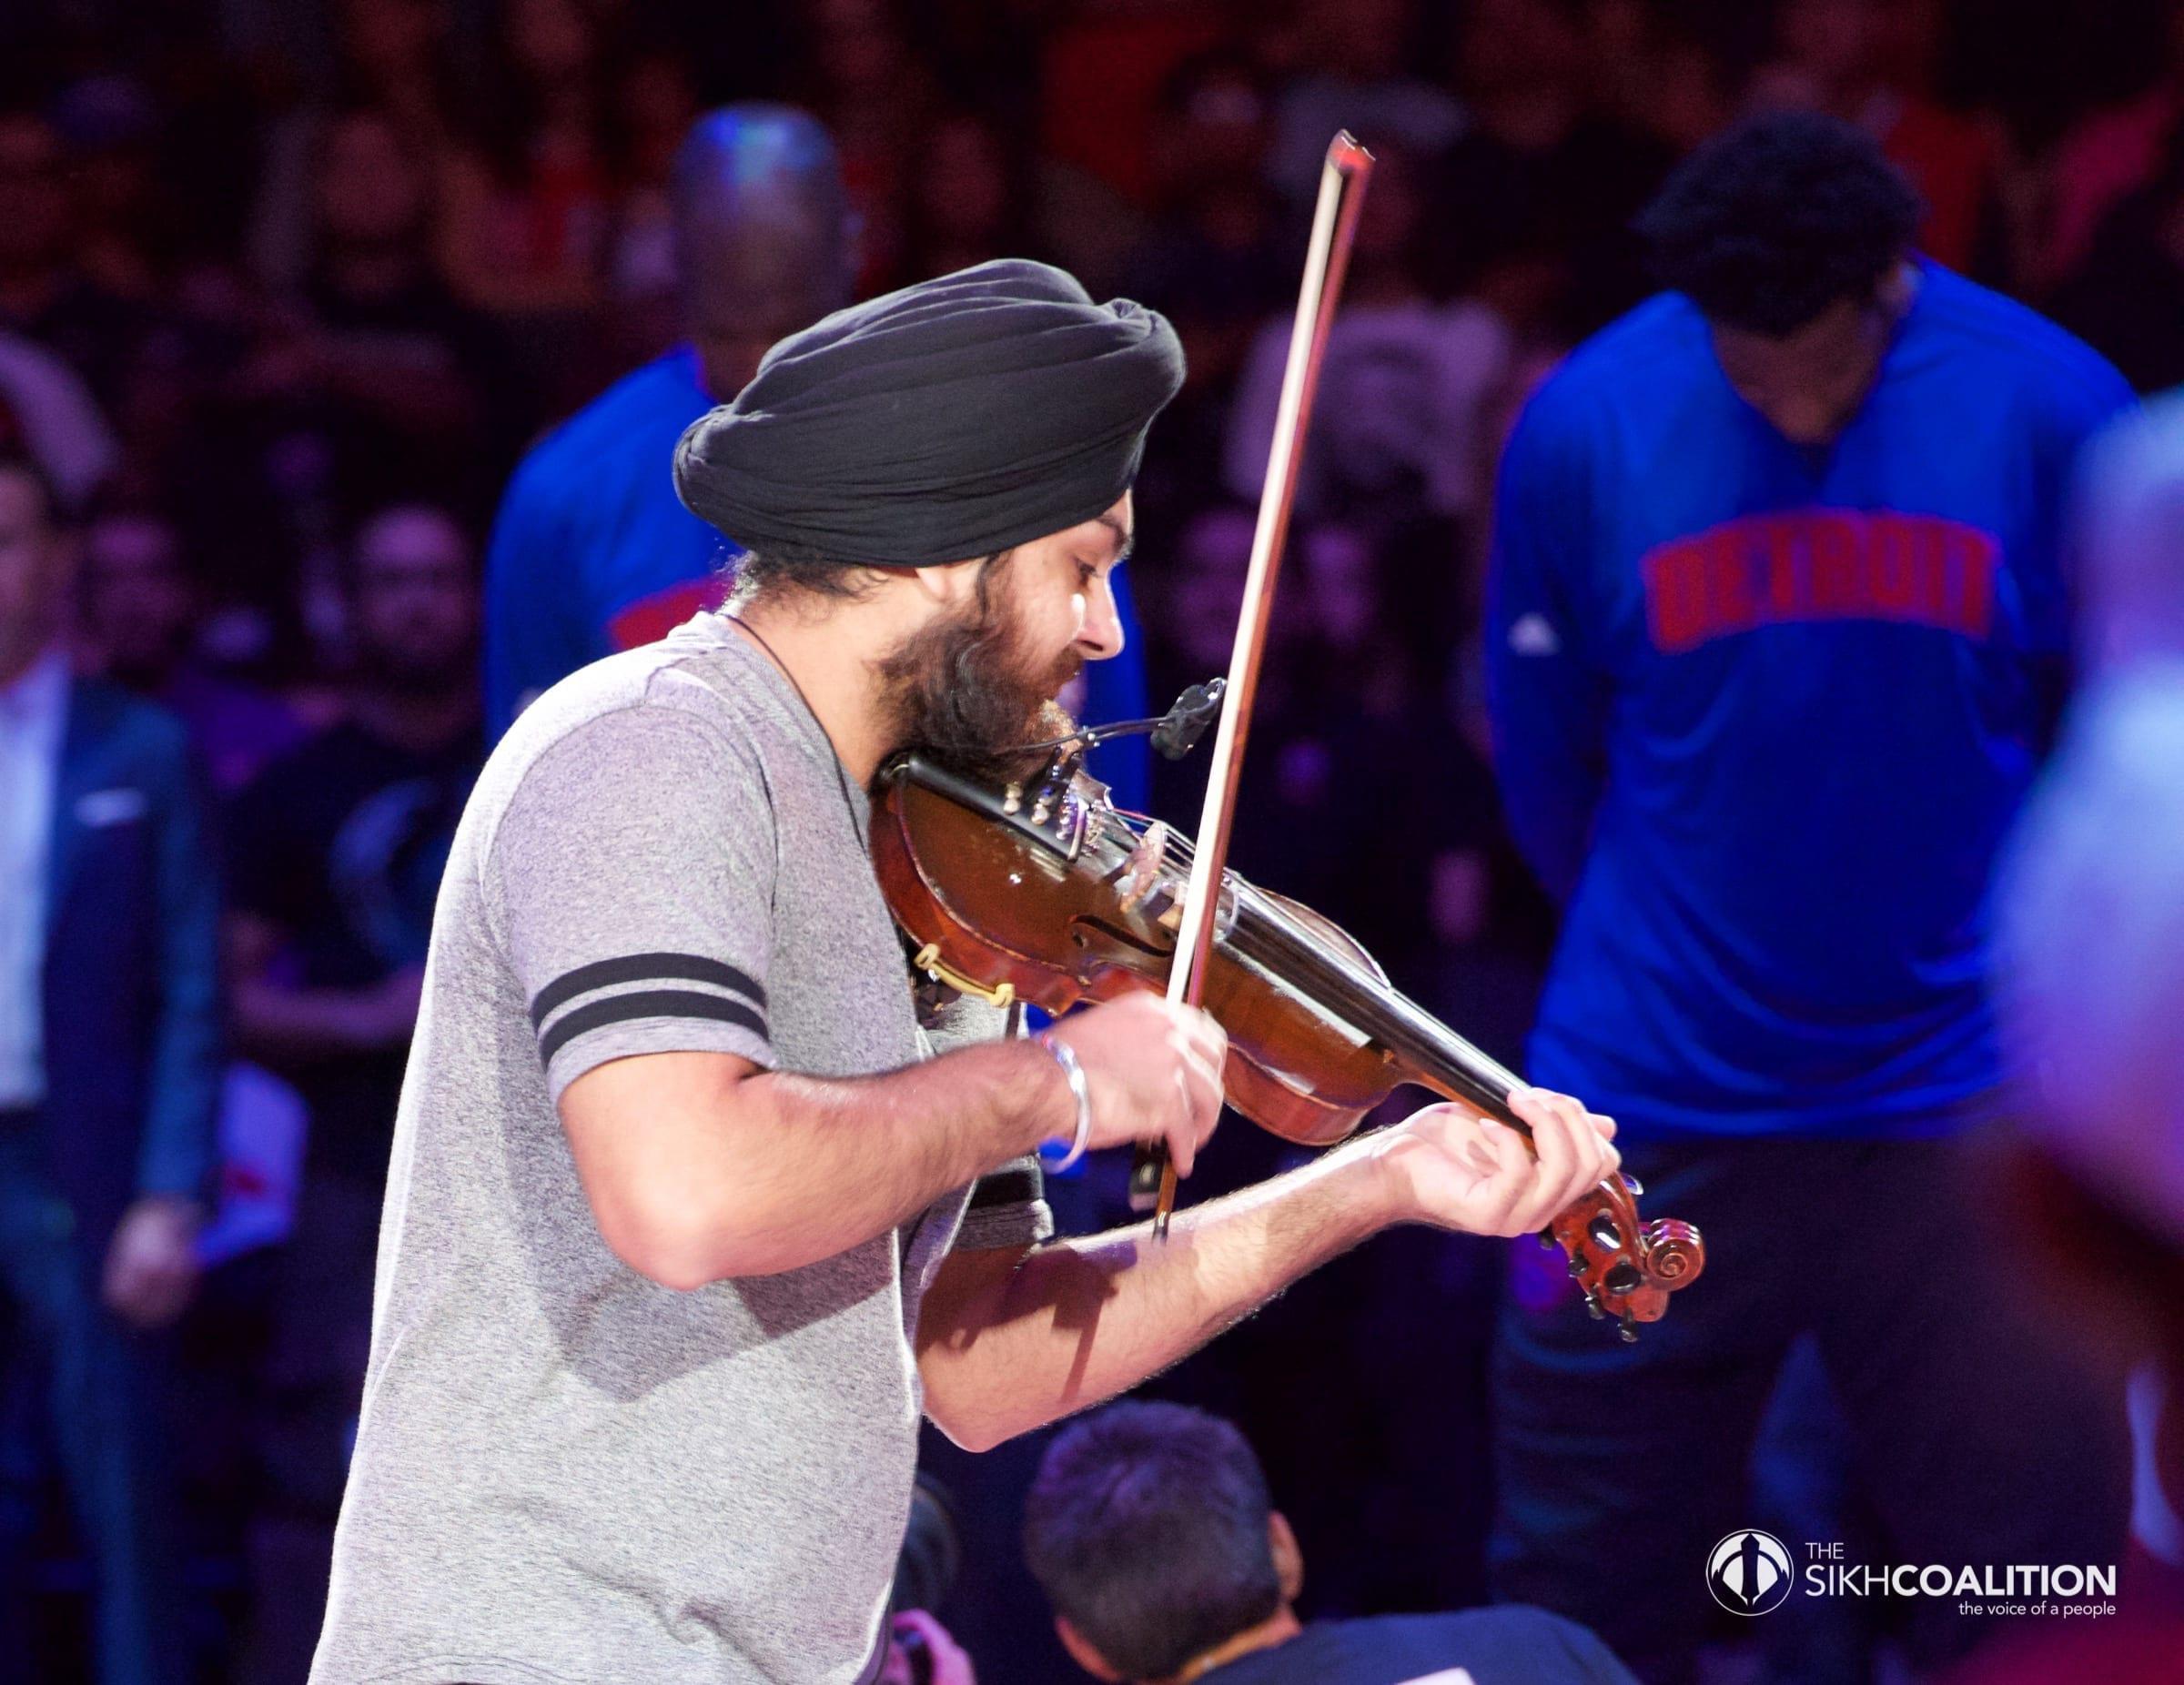 NBA Event Showcases Sikh Community